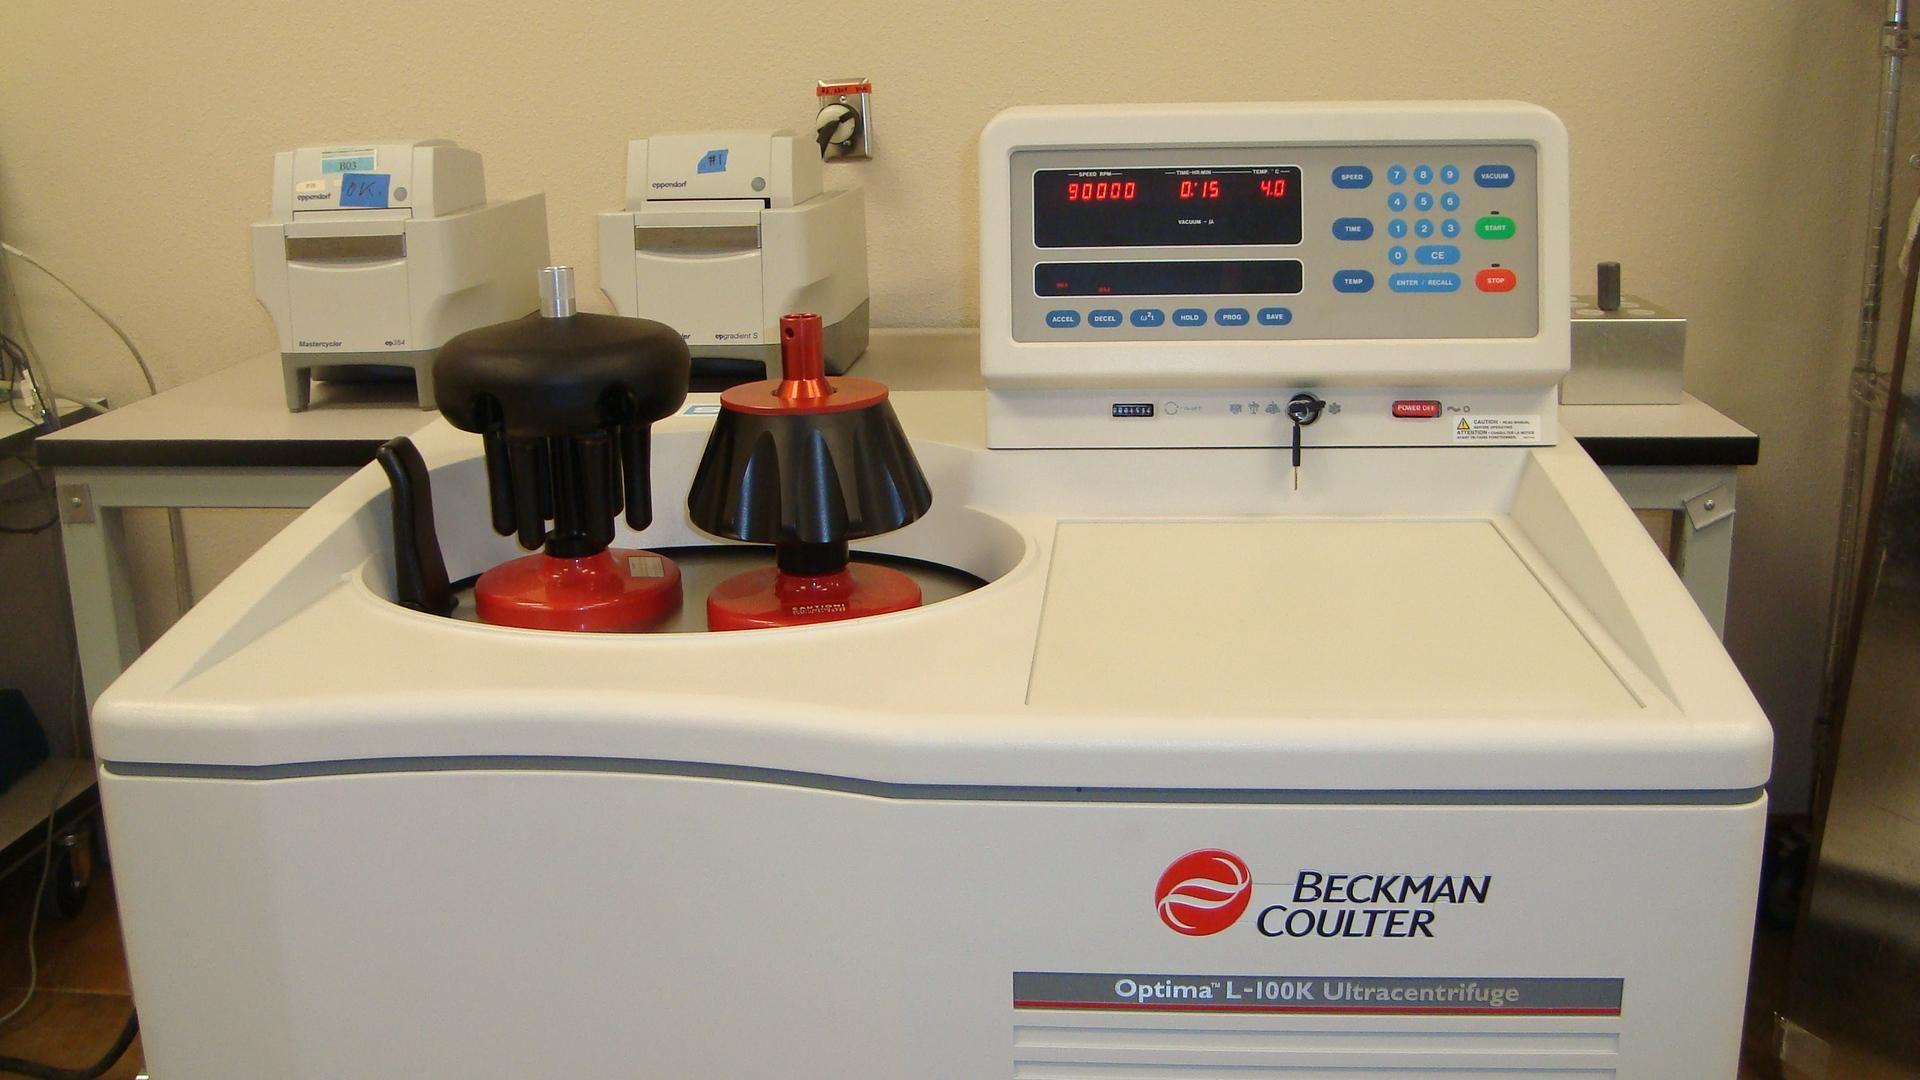 Beckman Optima L-100K Ultracentrifuge - Certified and Warranty